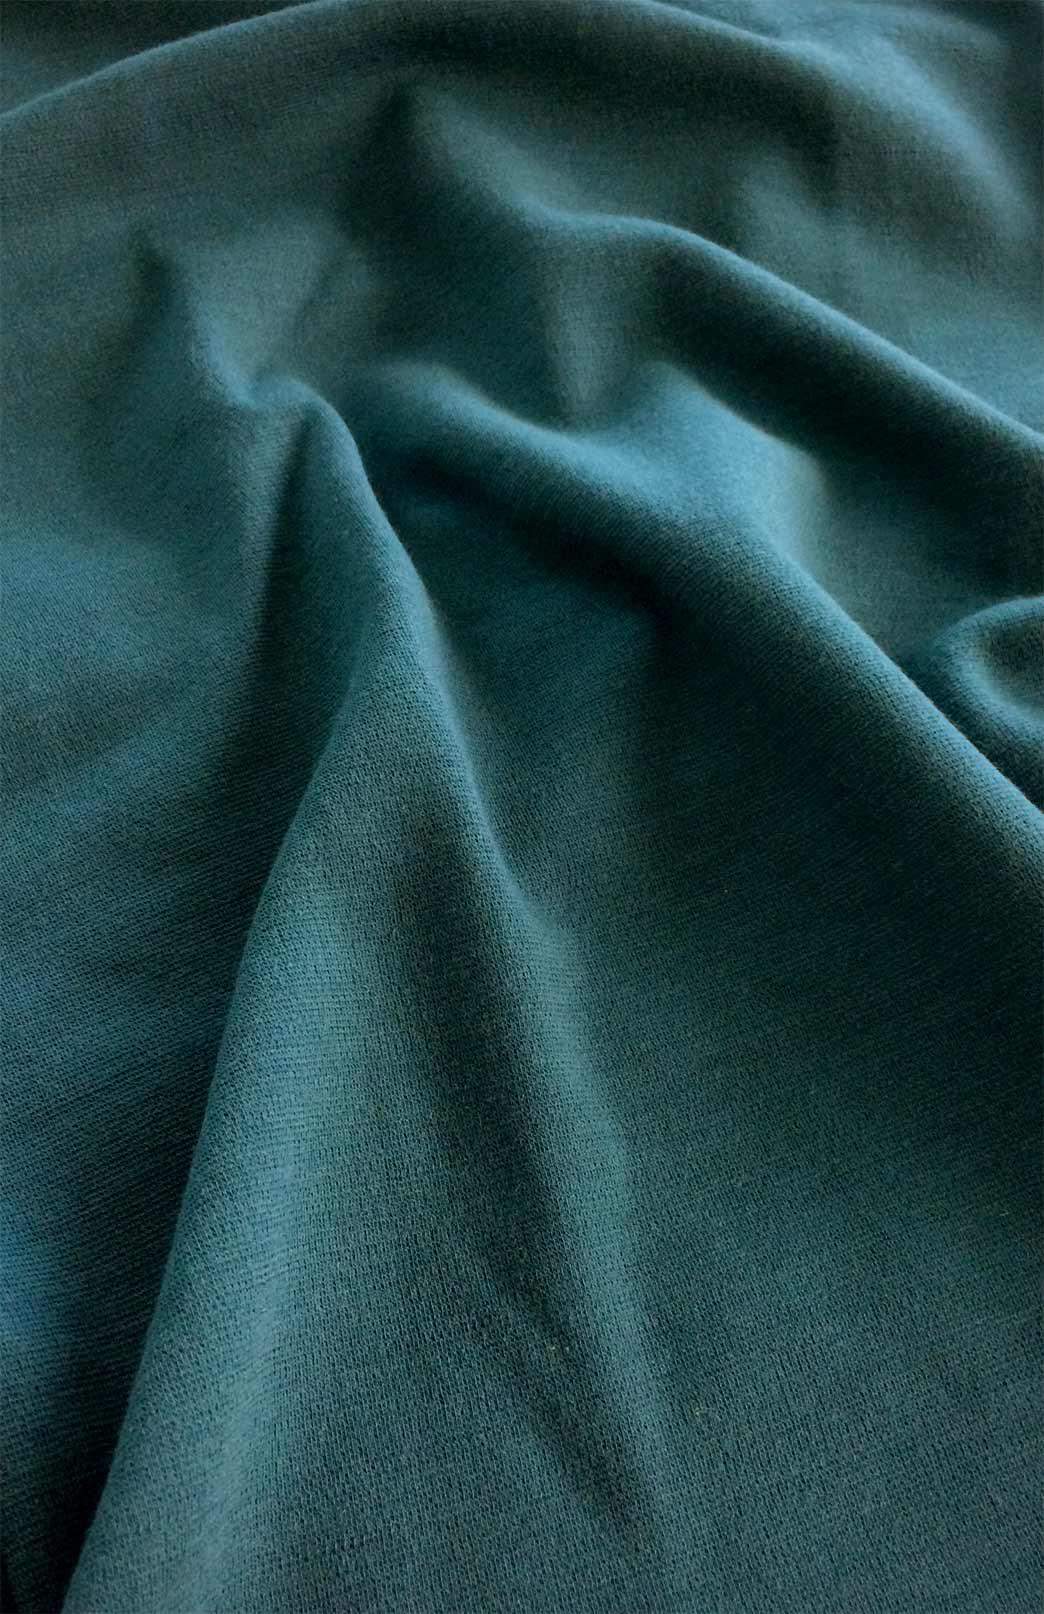 Missi Dress - Women's Teal Merino Wool Ponte Dress with Full Back Zip and High Neckline - Smitten Merino Tasmania Australia